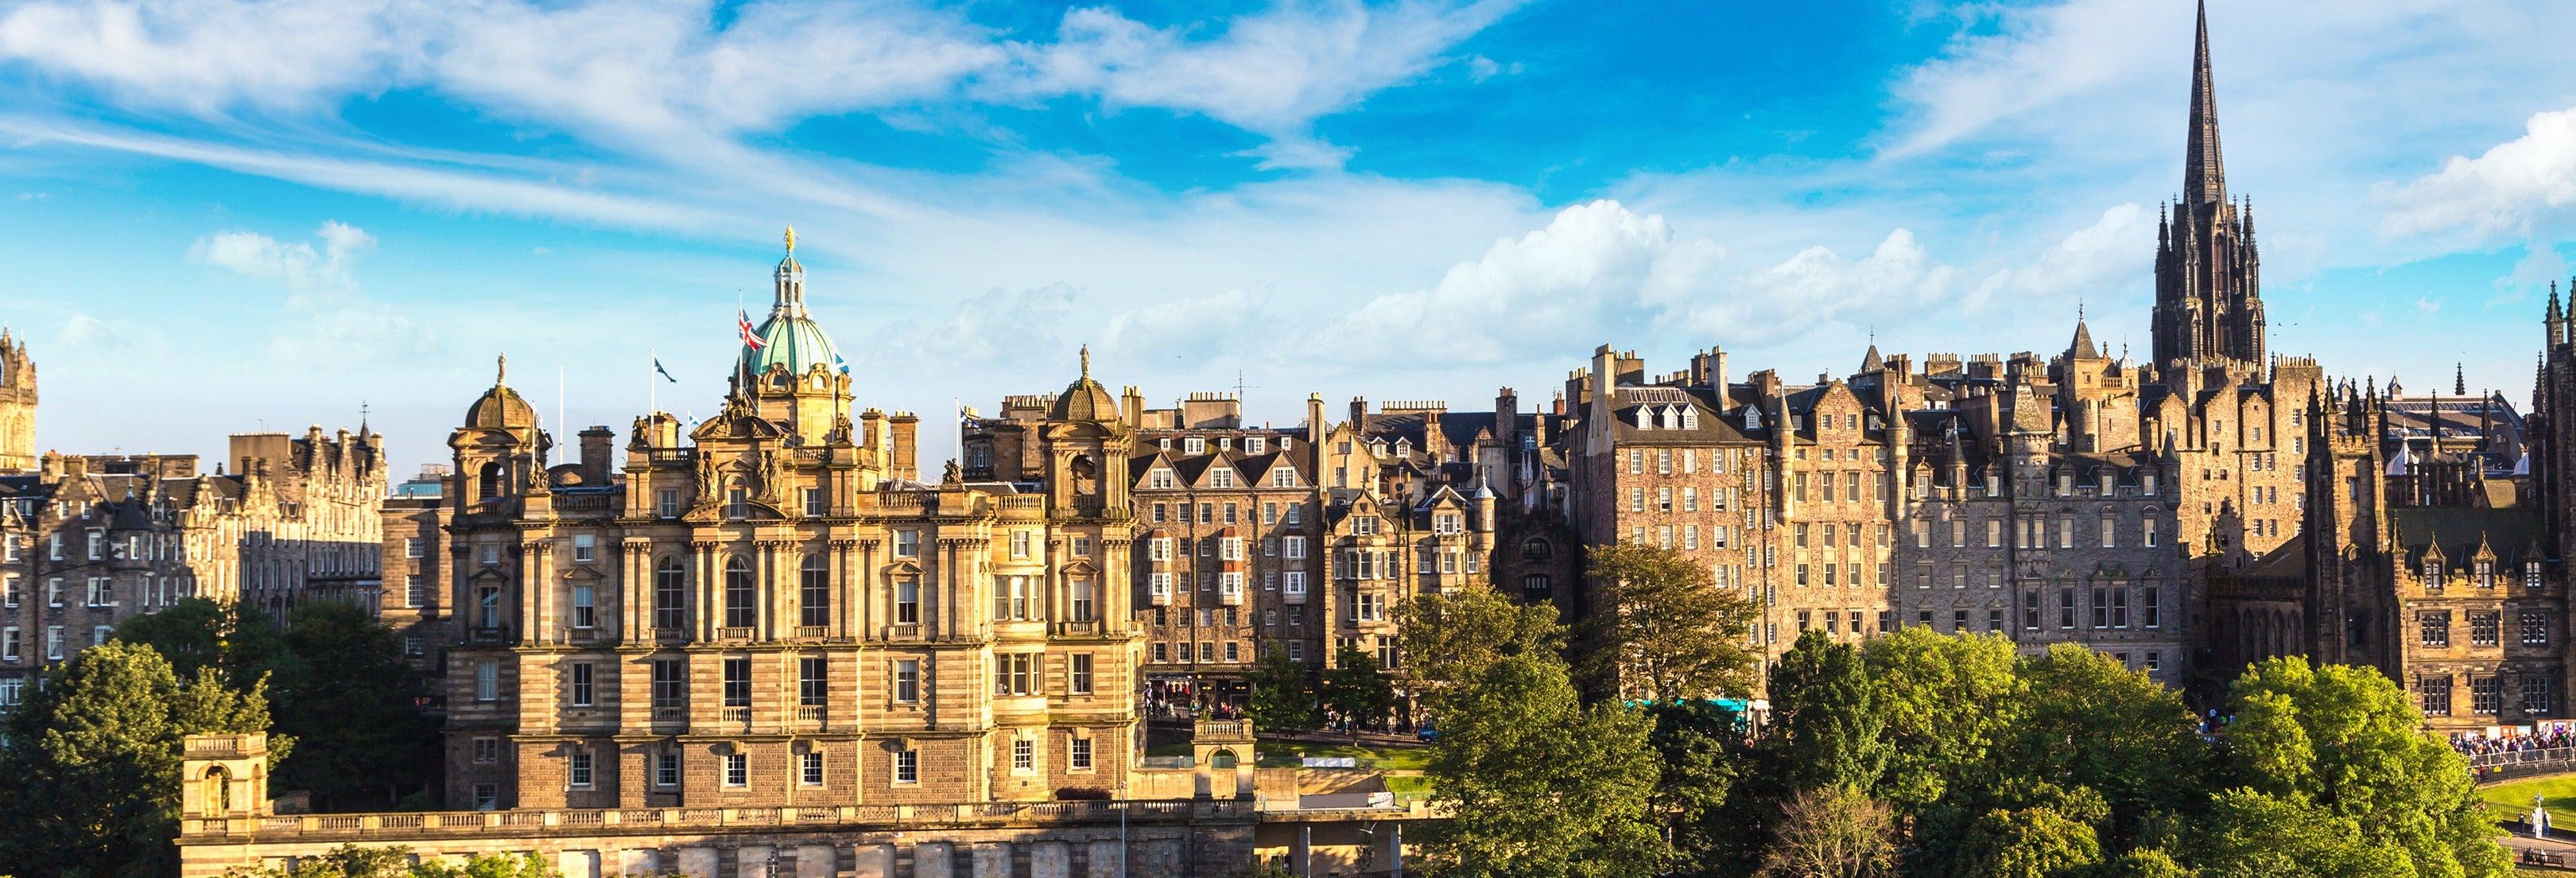 Tour por la Ciudad Nueva de Edimburgo